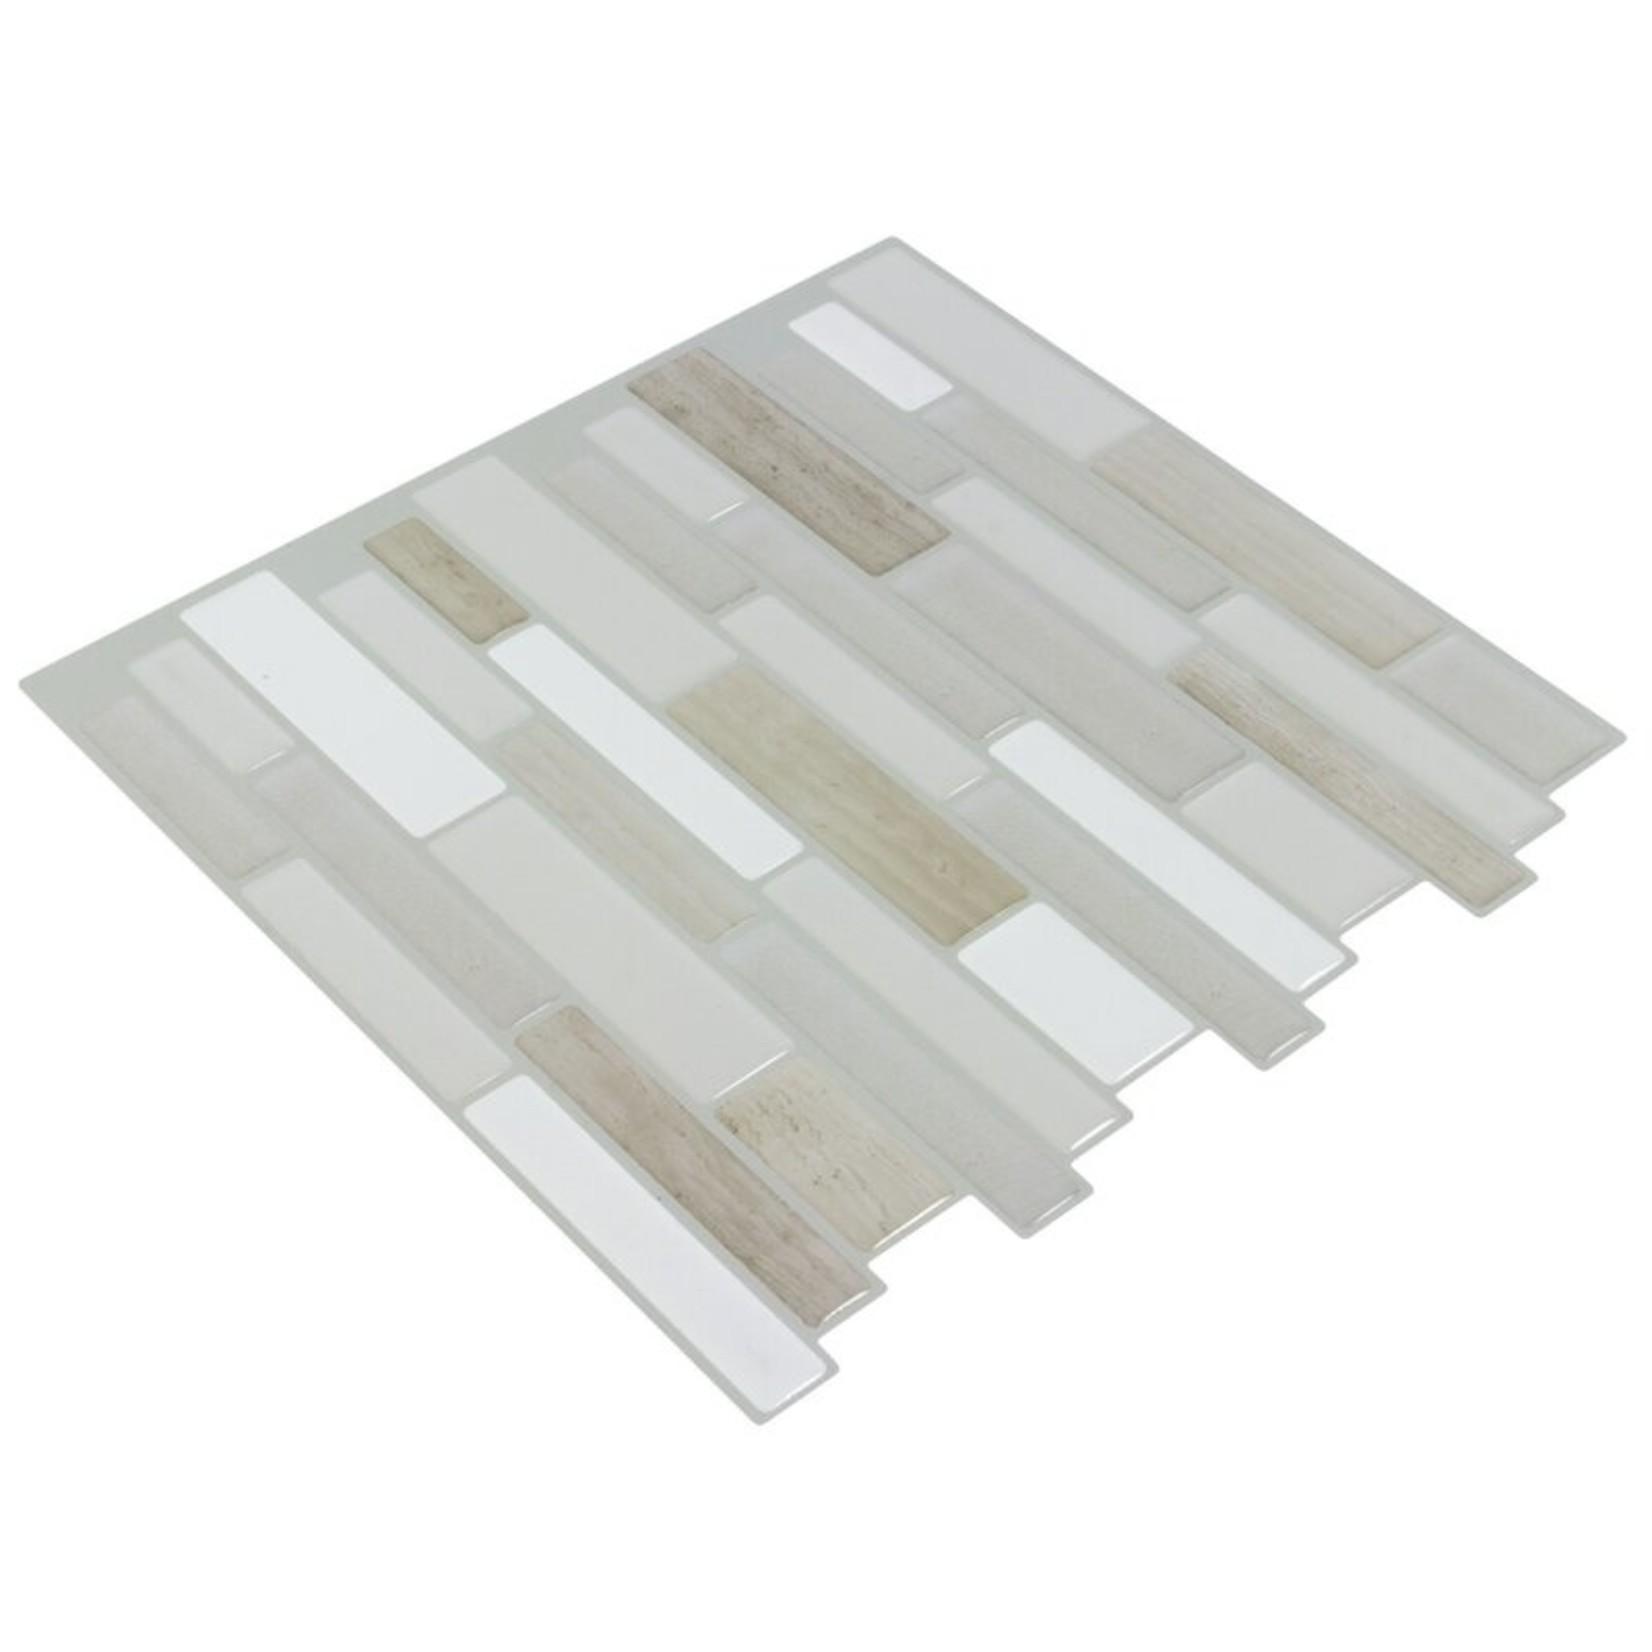 "*10"" x 10"" Vinyl Peel & Stick Mosaic Tile in Gray/Khaki"